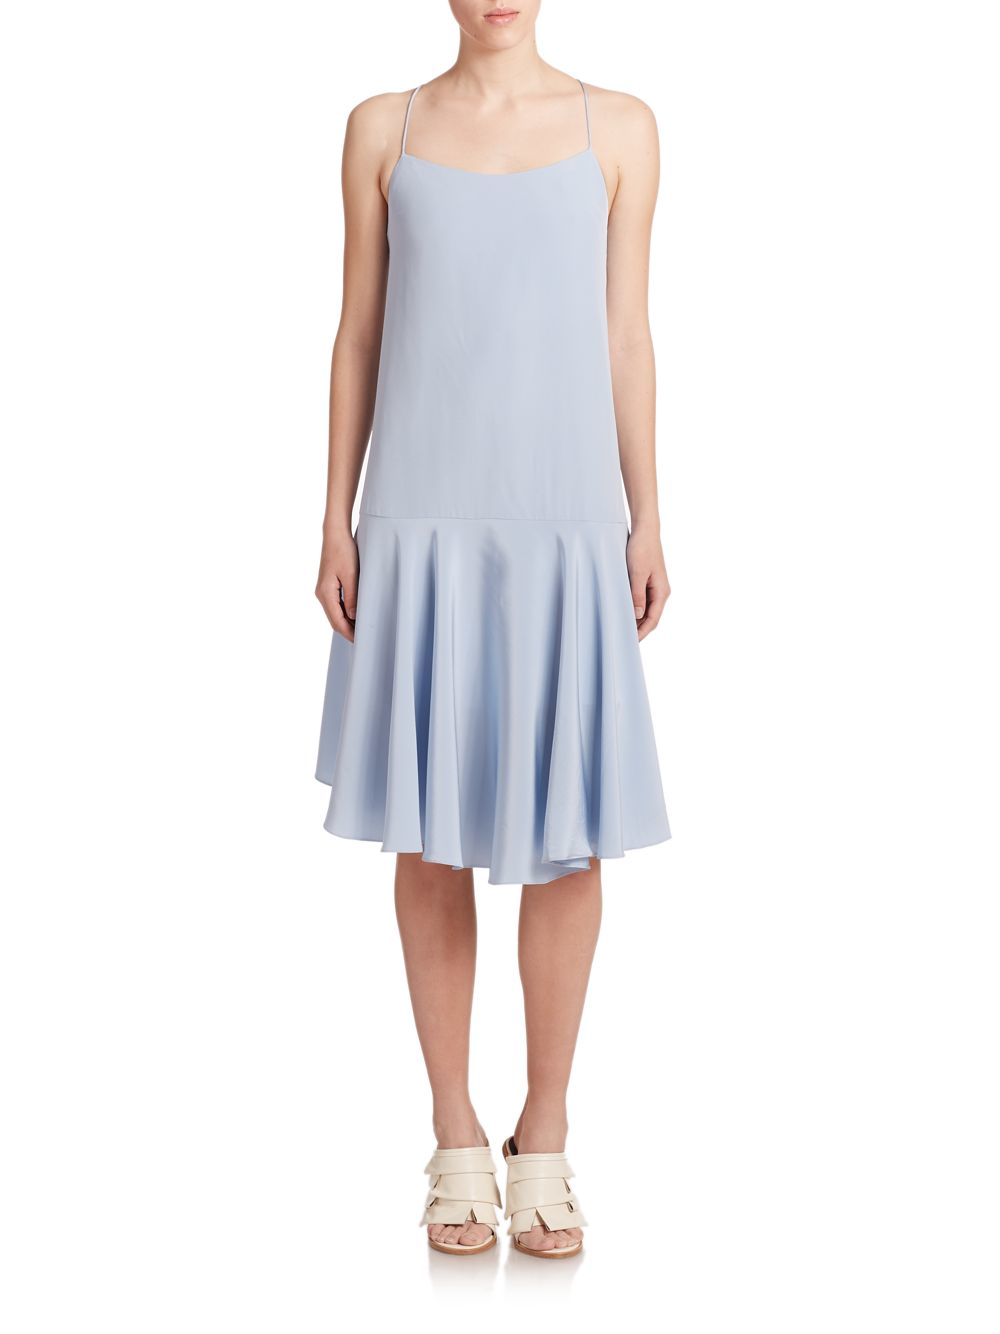 Tibi Heavy Silk Drop-waist Dress in Blue - Lyst